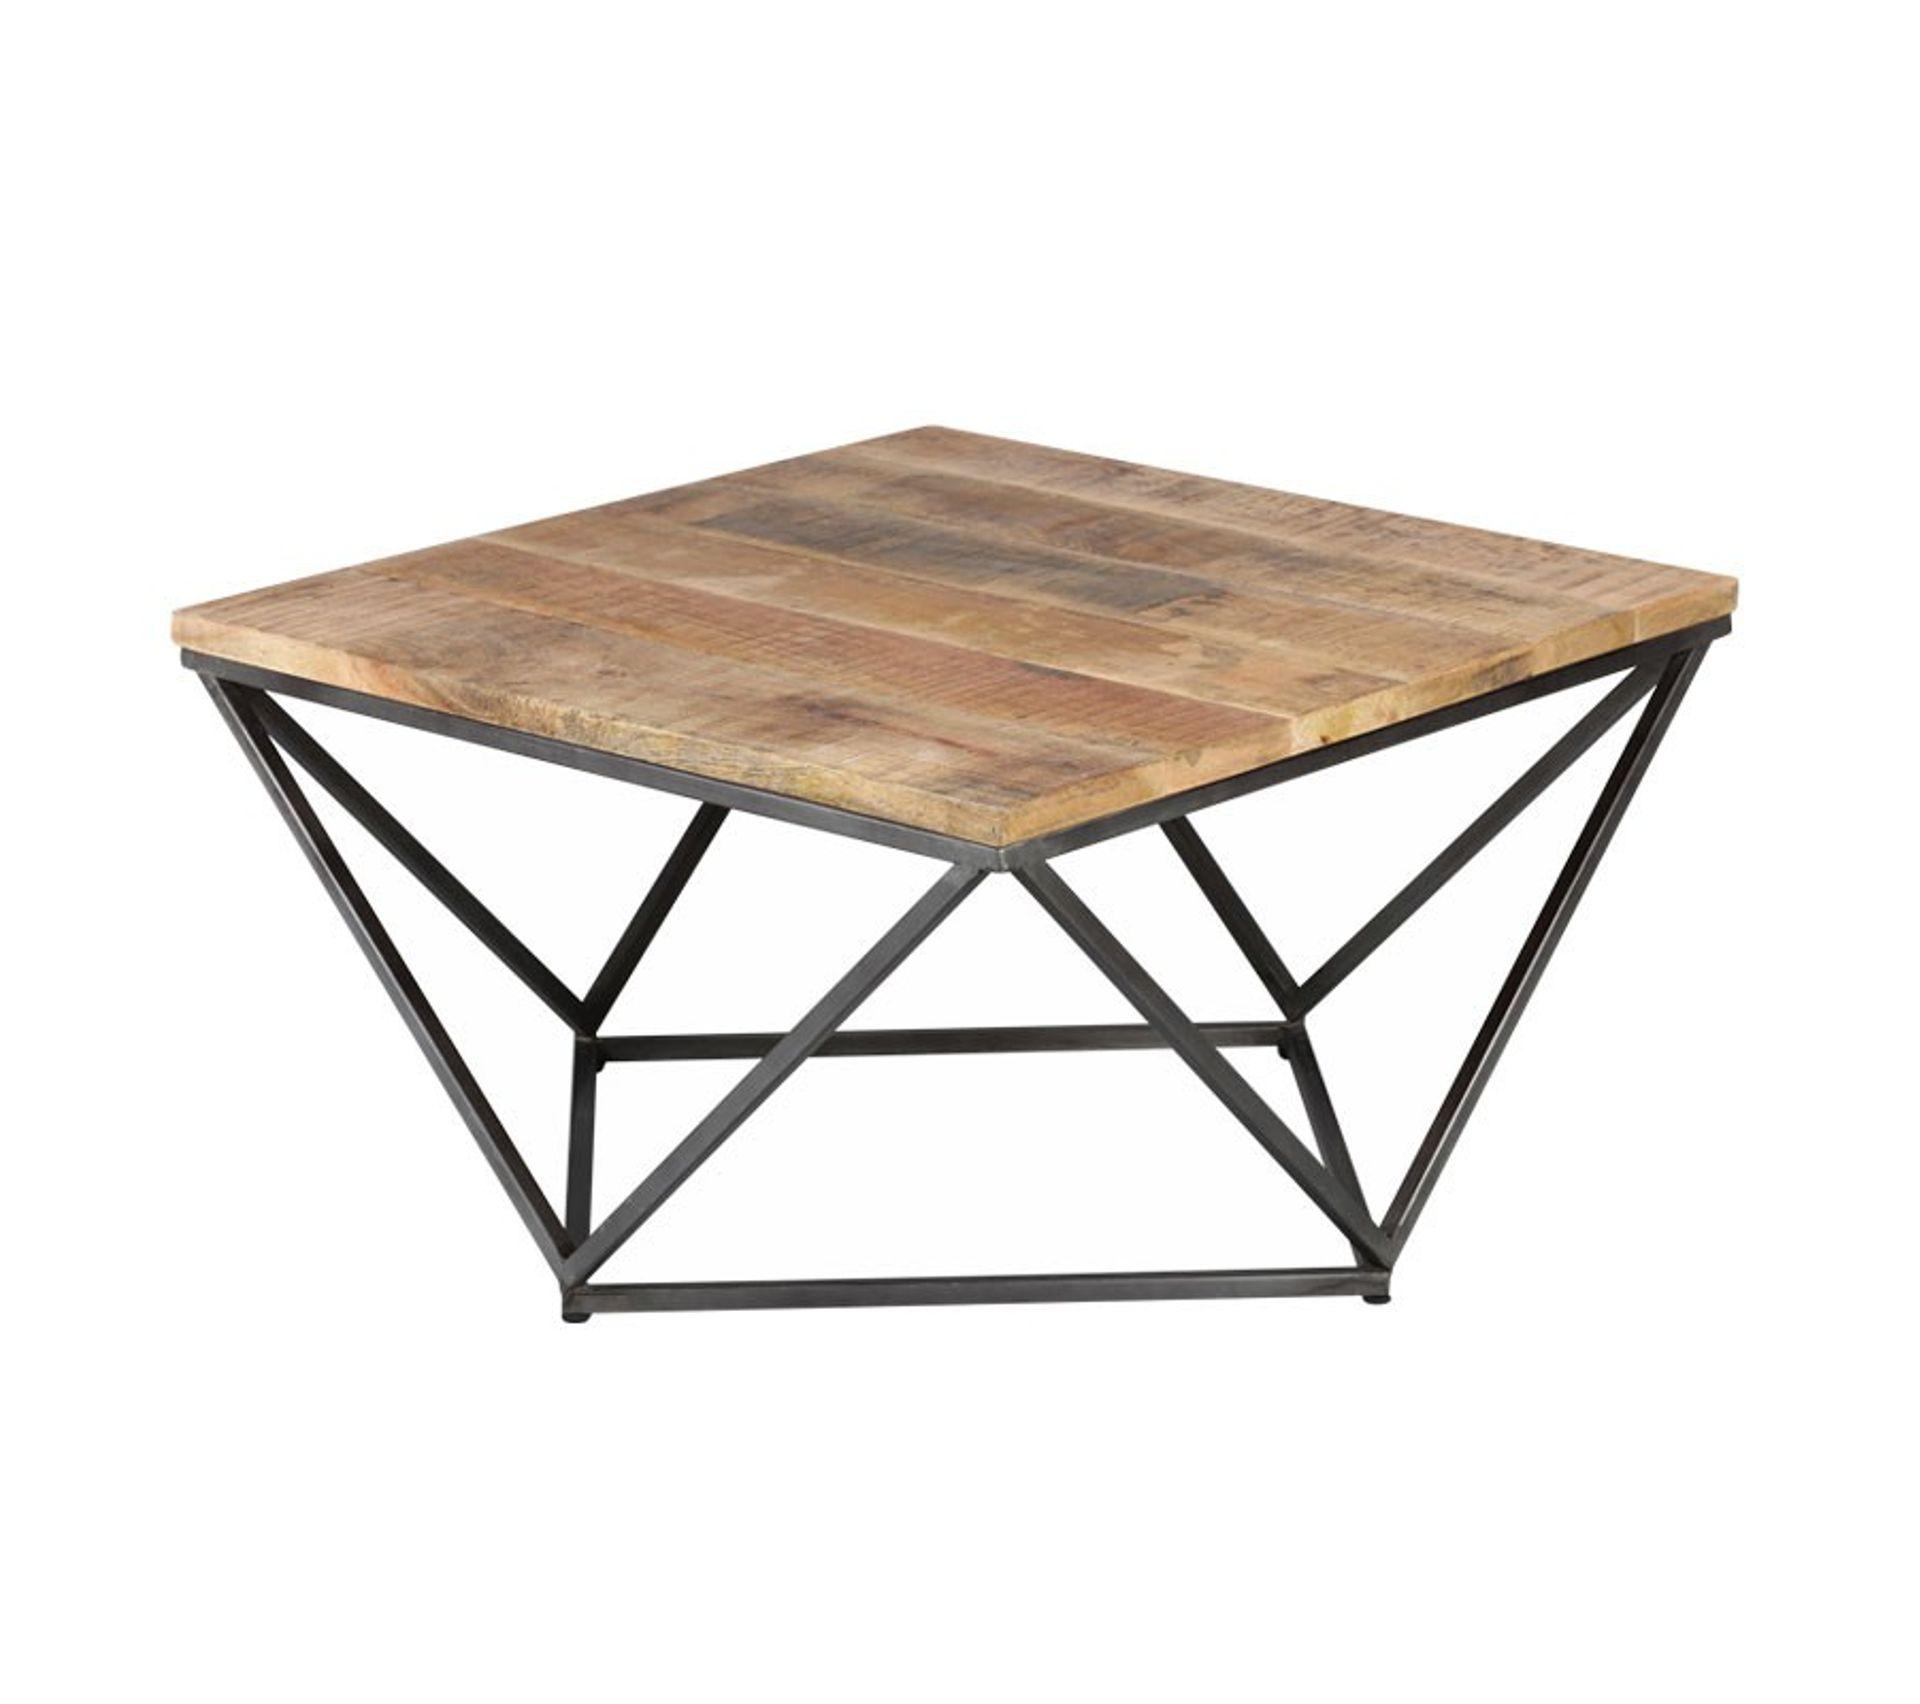 Table Basse Carree Metal Et Bois